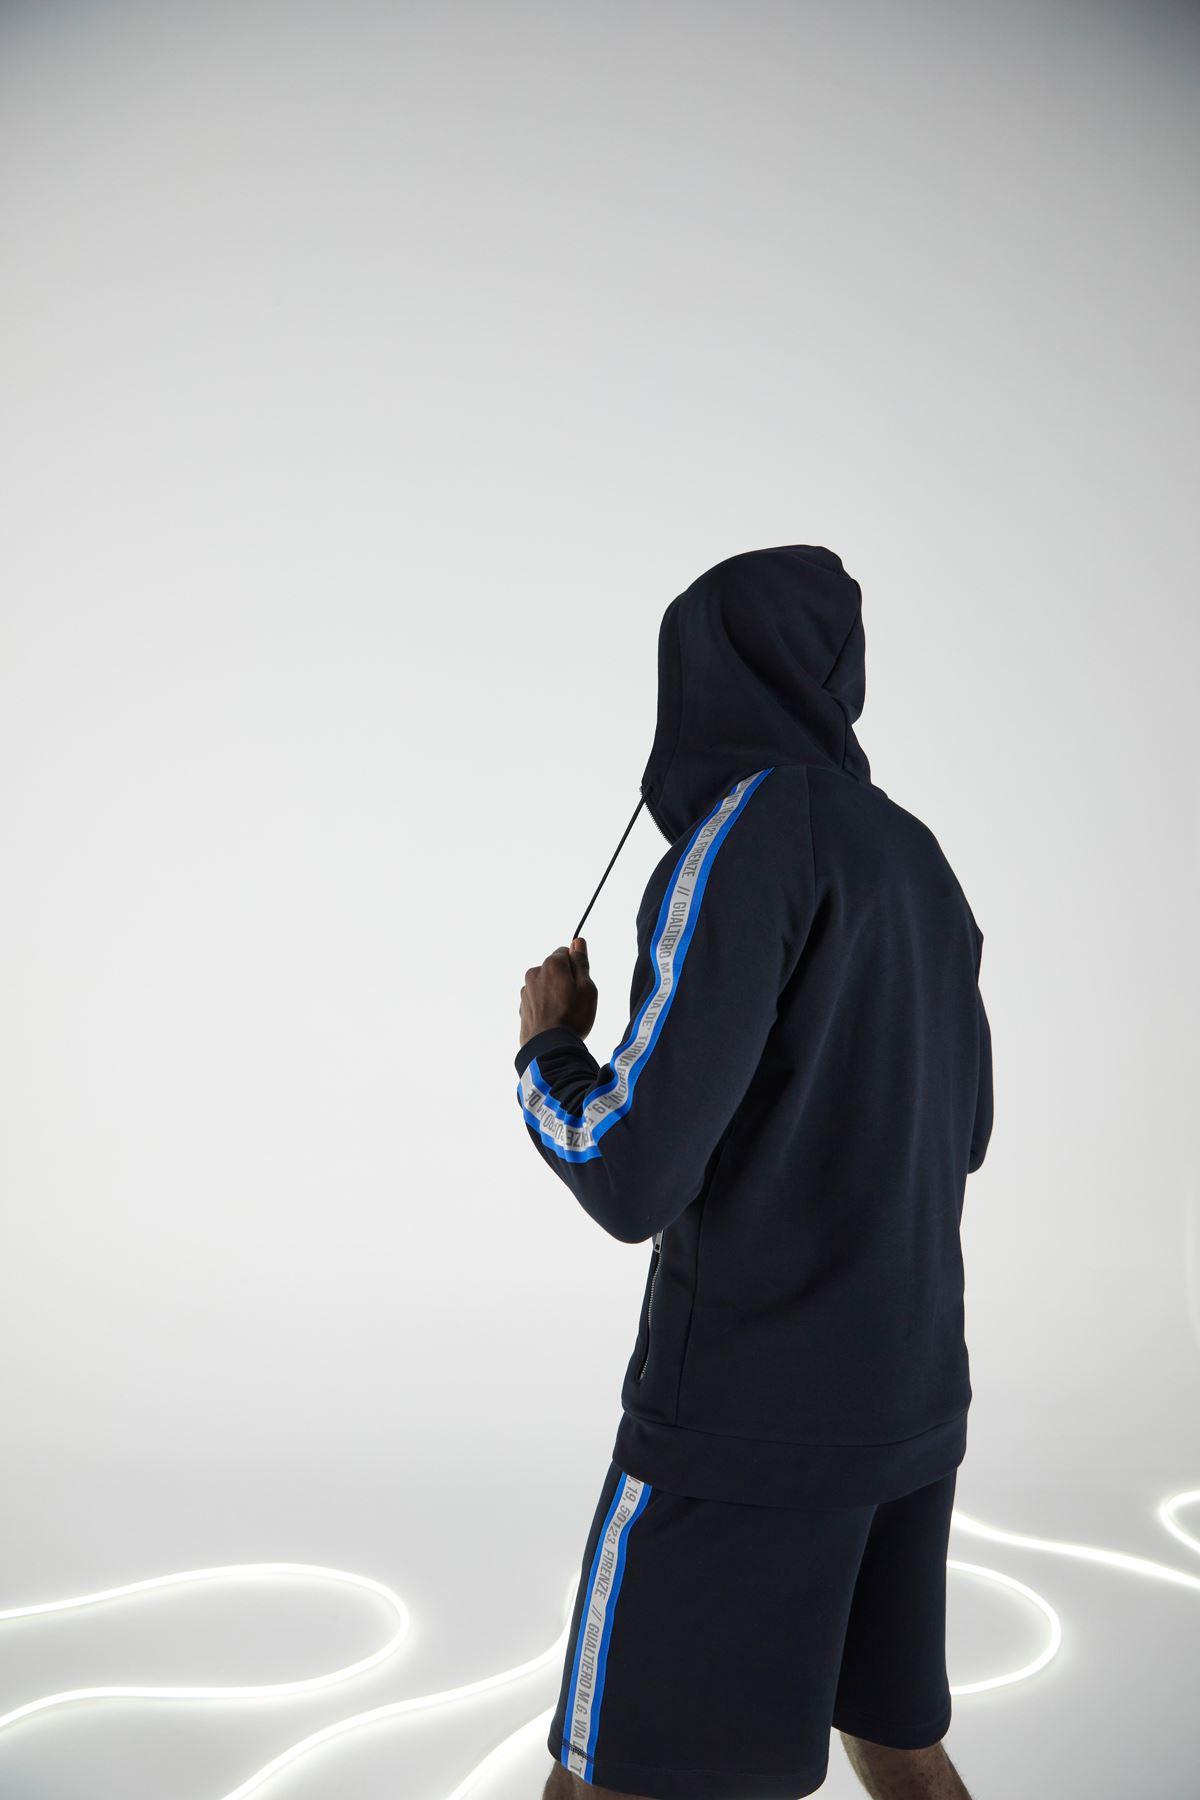 Lacivert Kapüşonlu Fermuarlı Eşofman Üstü Sweatshirt